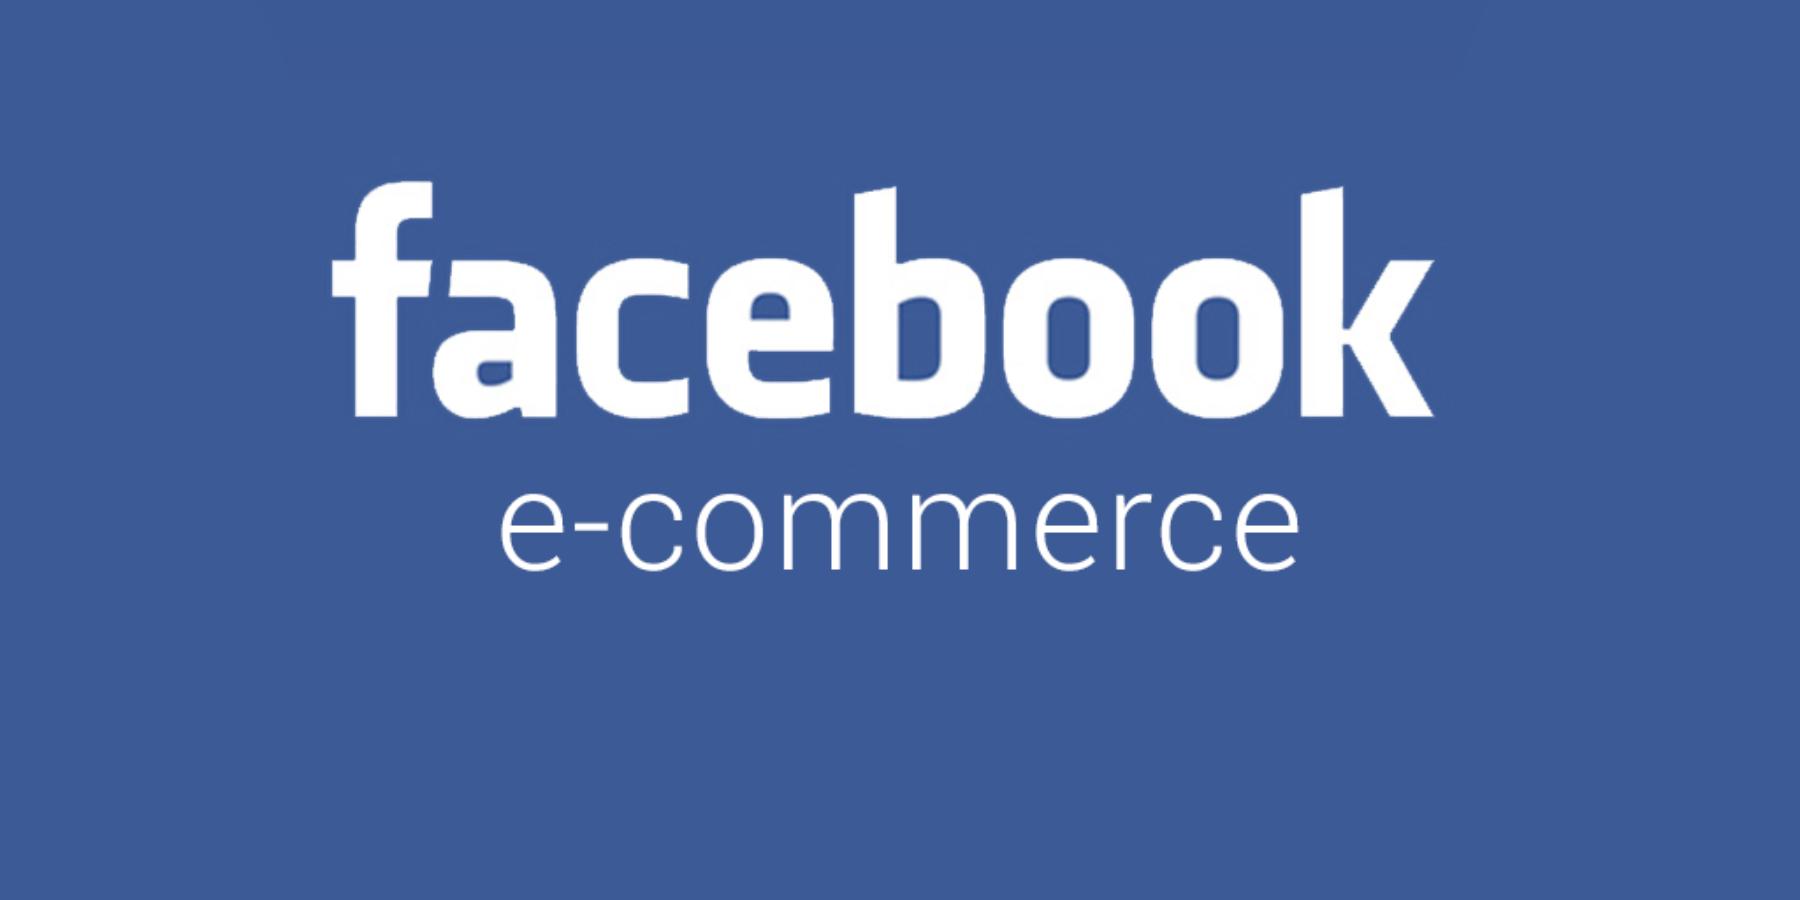 Jak Facebook zmienia sposób myślenia oE-commerce?